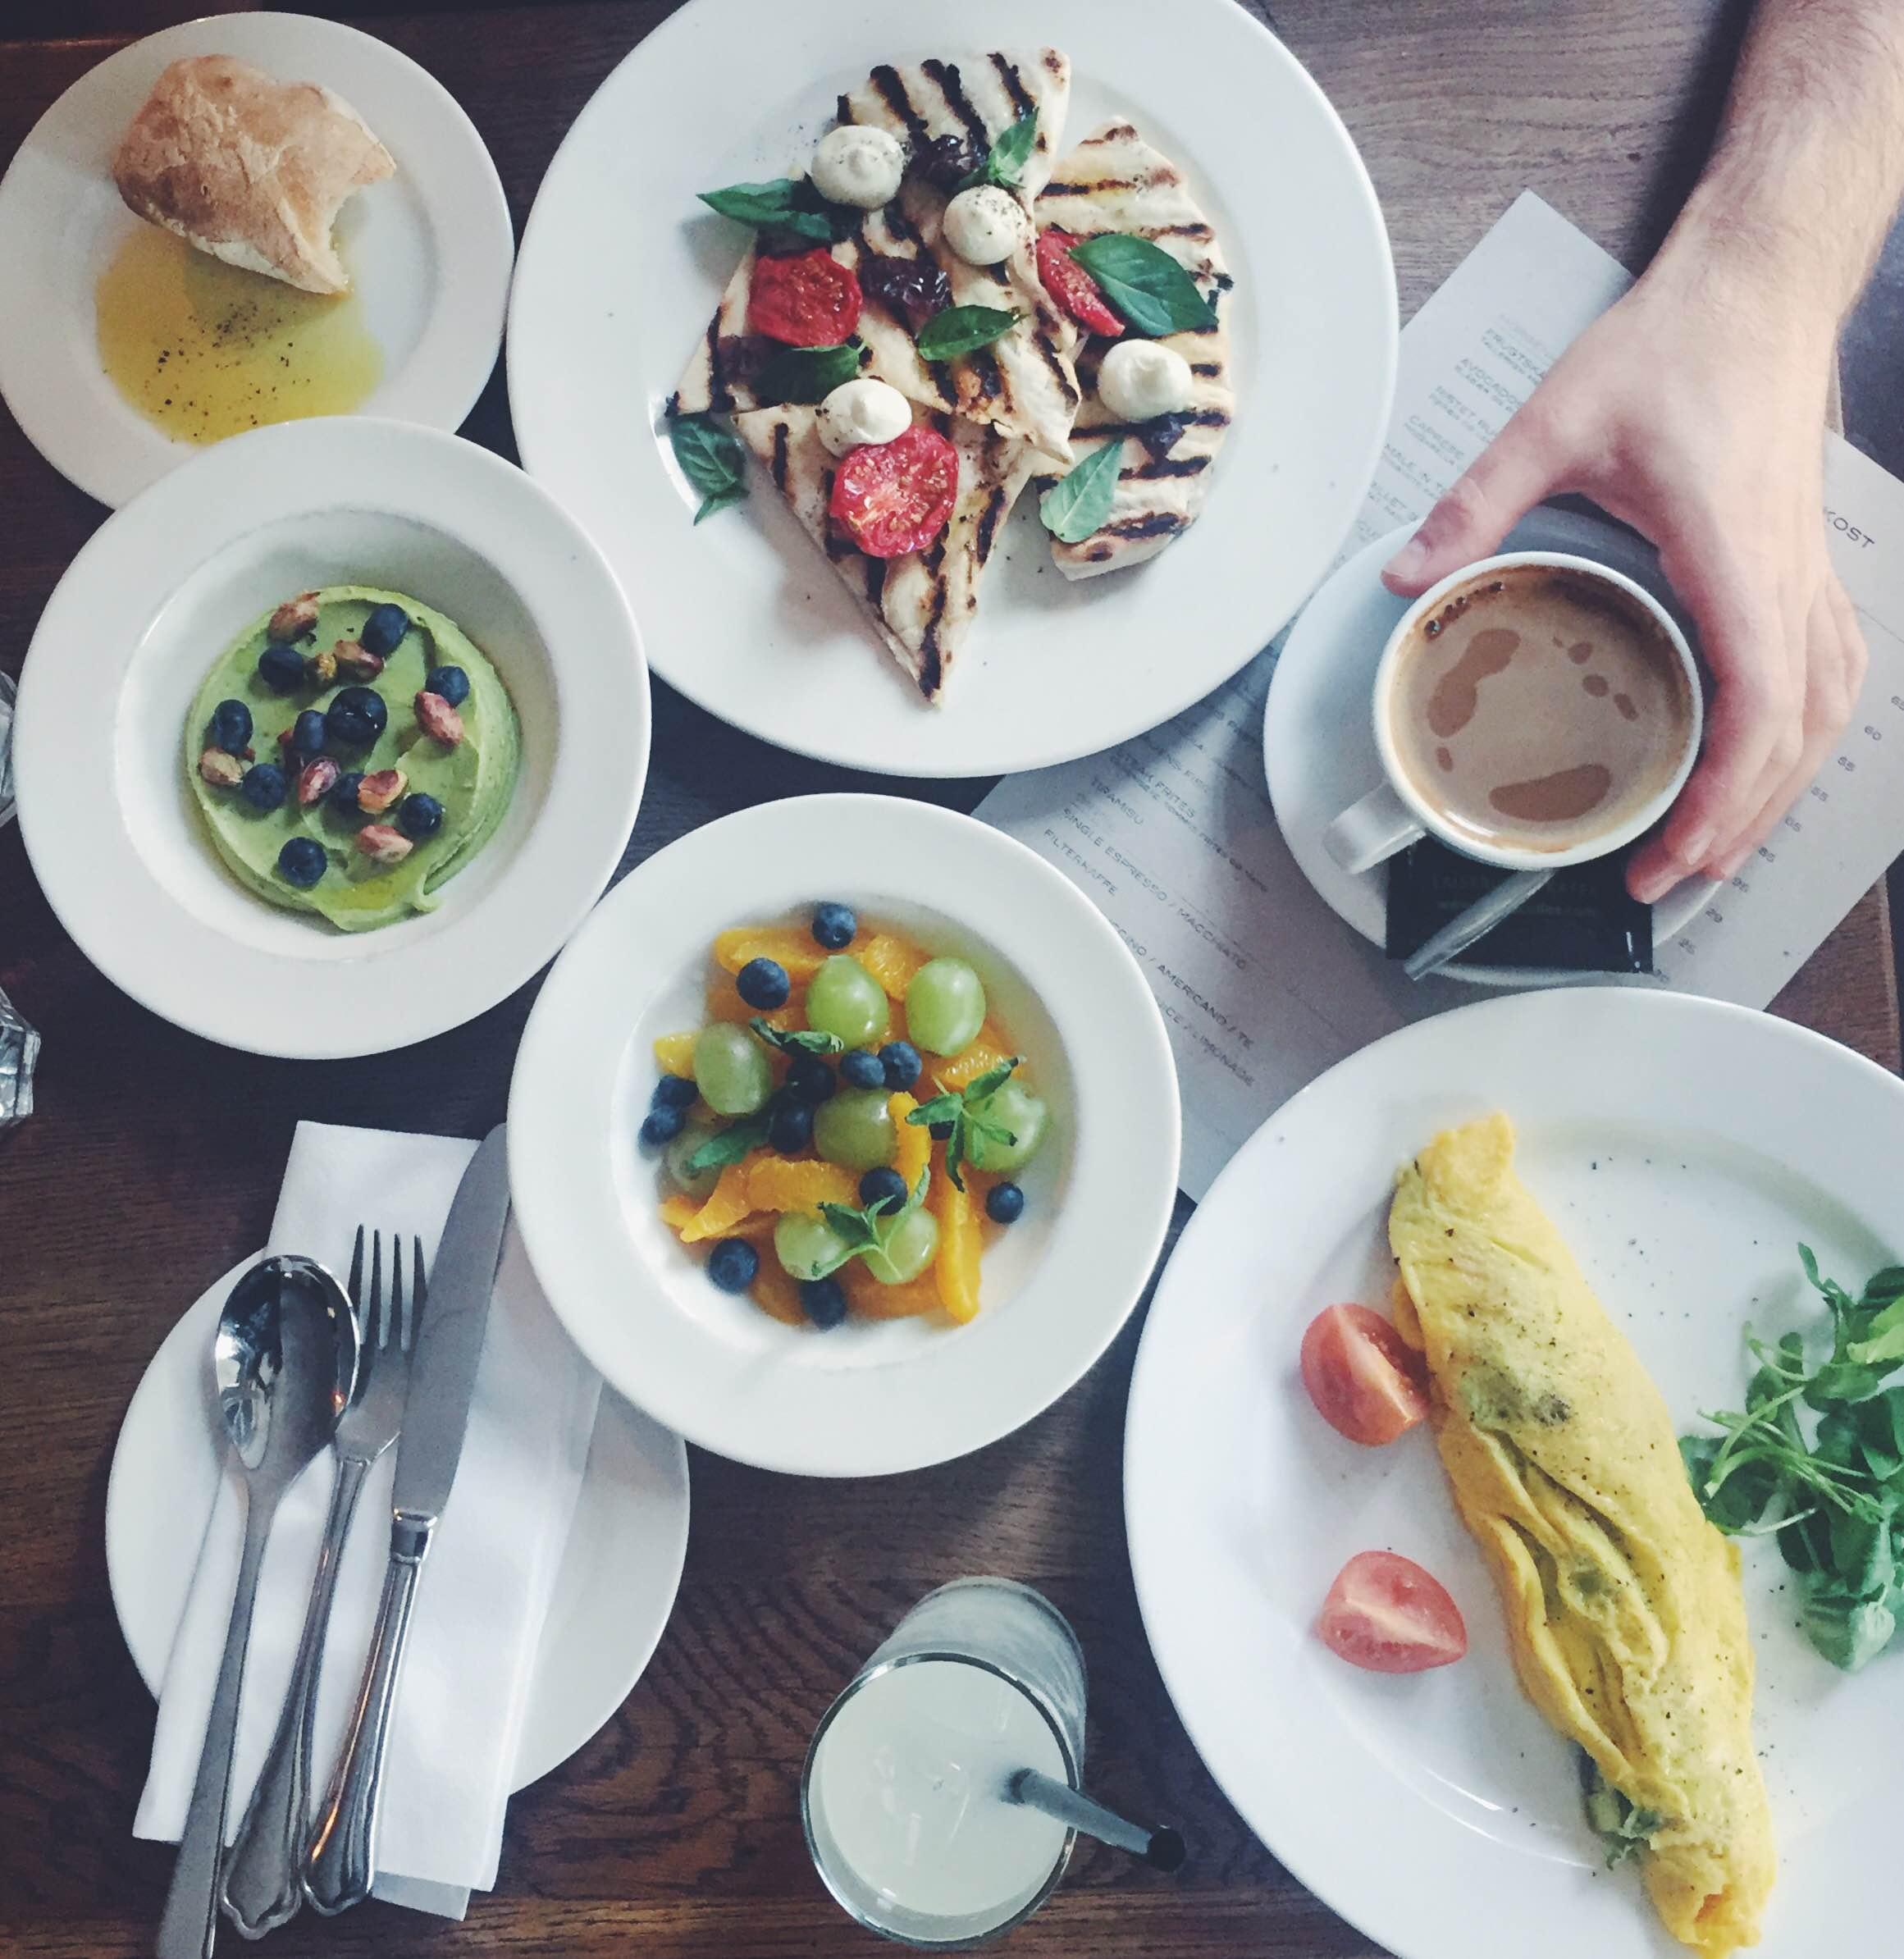 Morgenmad på Østerbro. Avokado-skyr, kaffe, pizza og frisk frugt